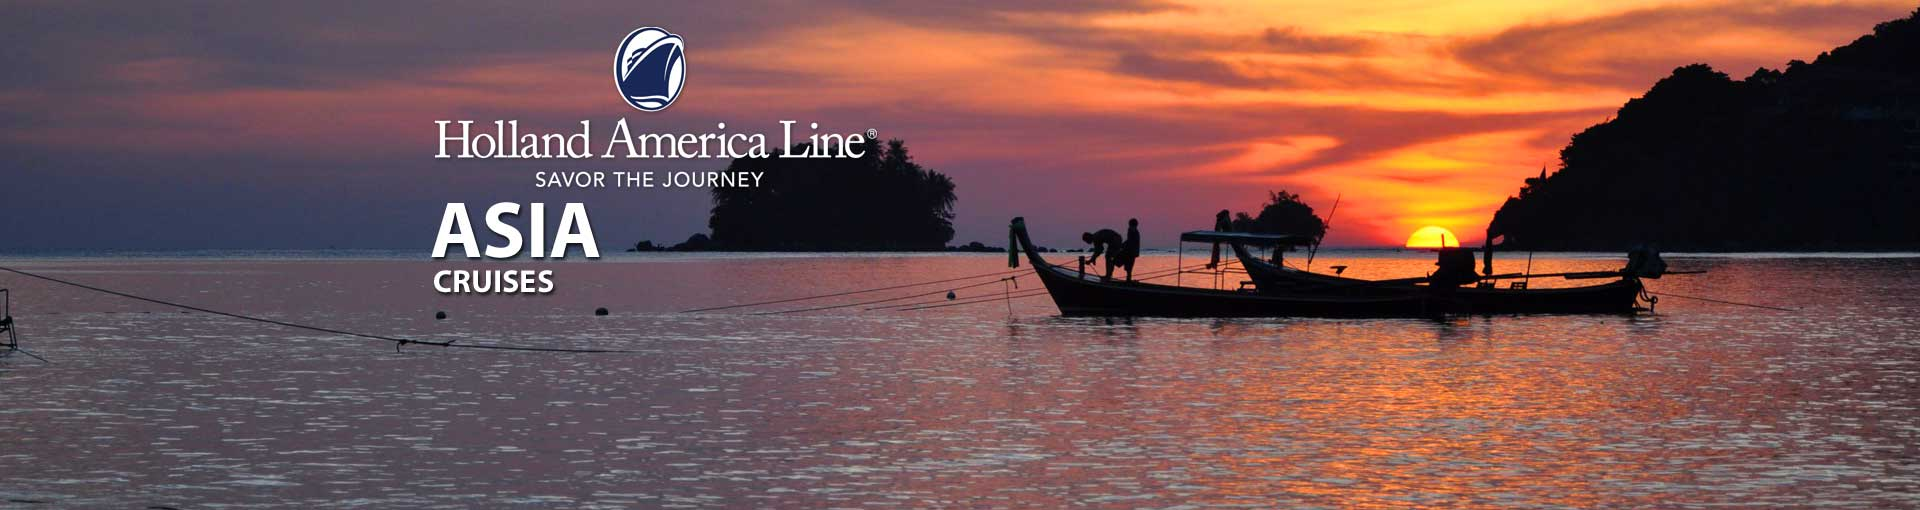 Holland America Asia Cruises